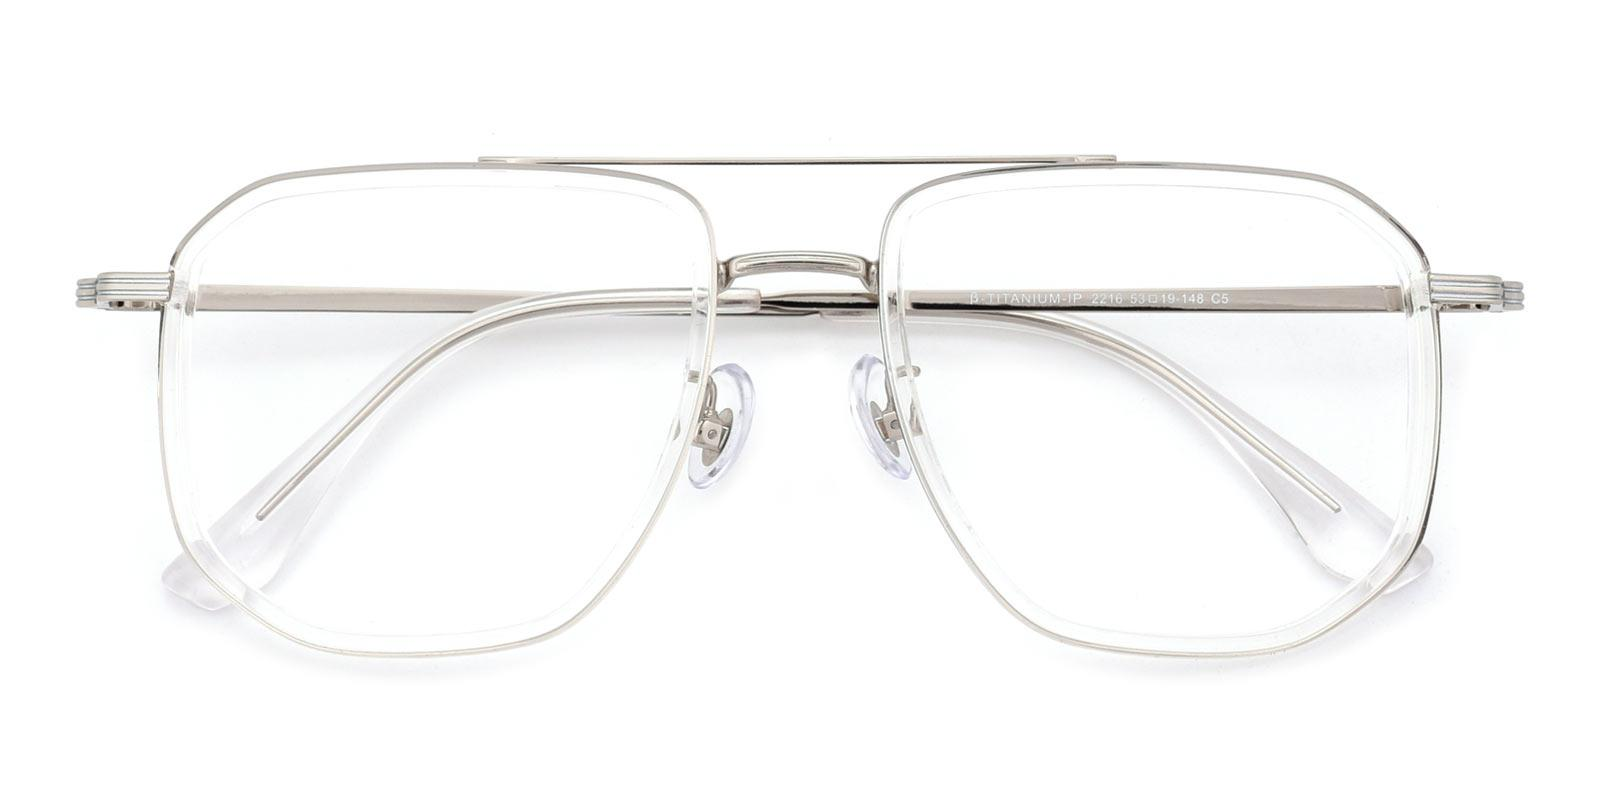 Titan-Translucent-Aviator / Square-TR-Eyeglasses-detail